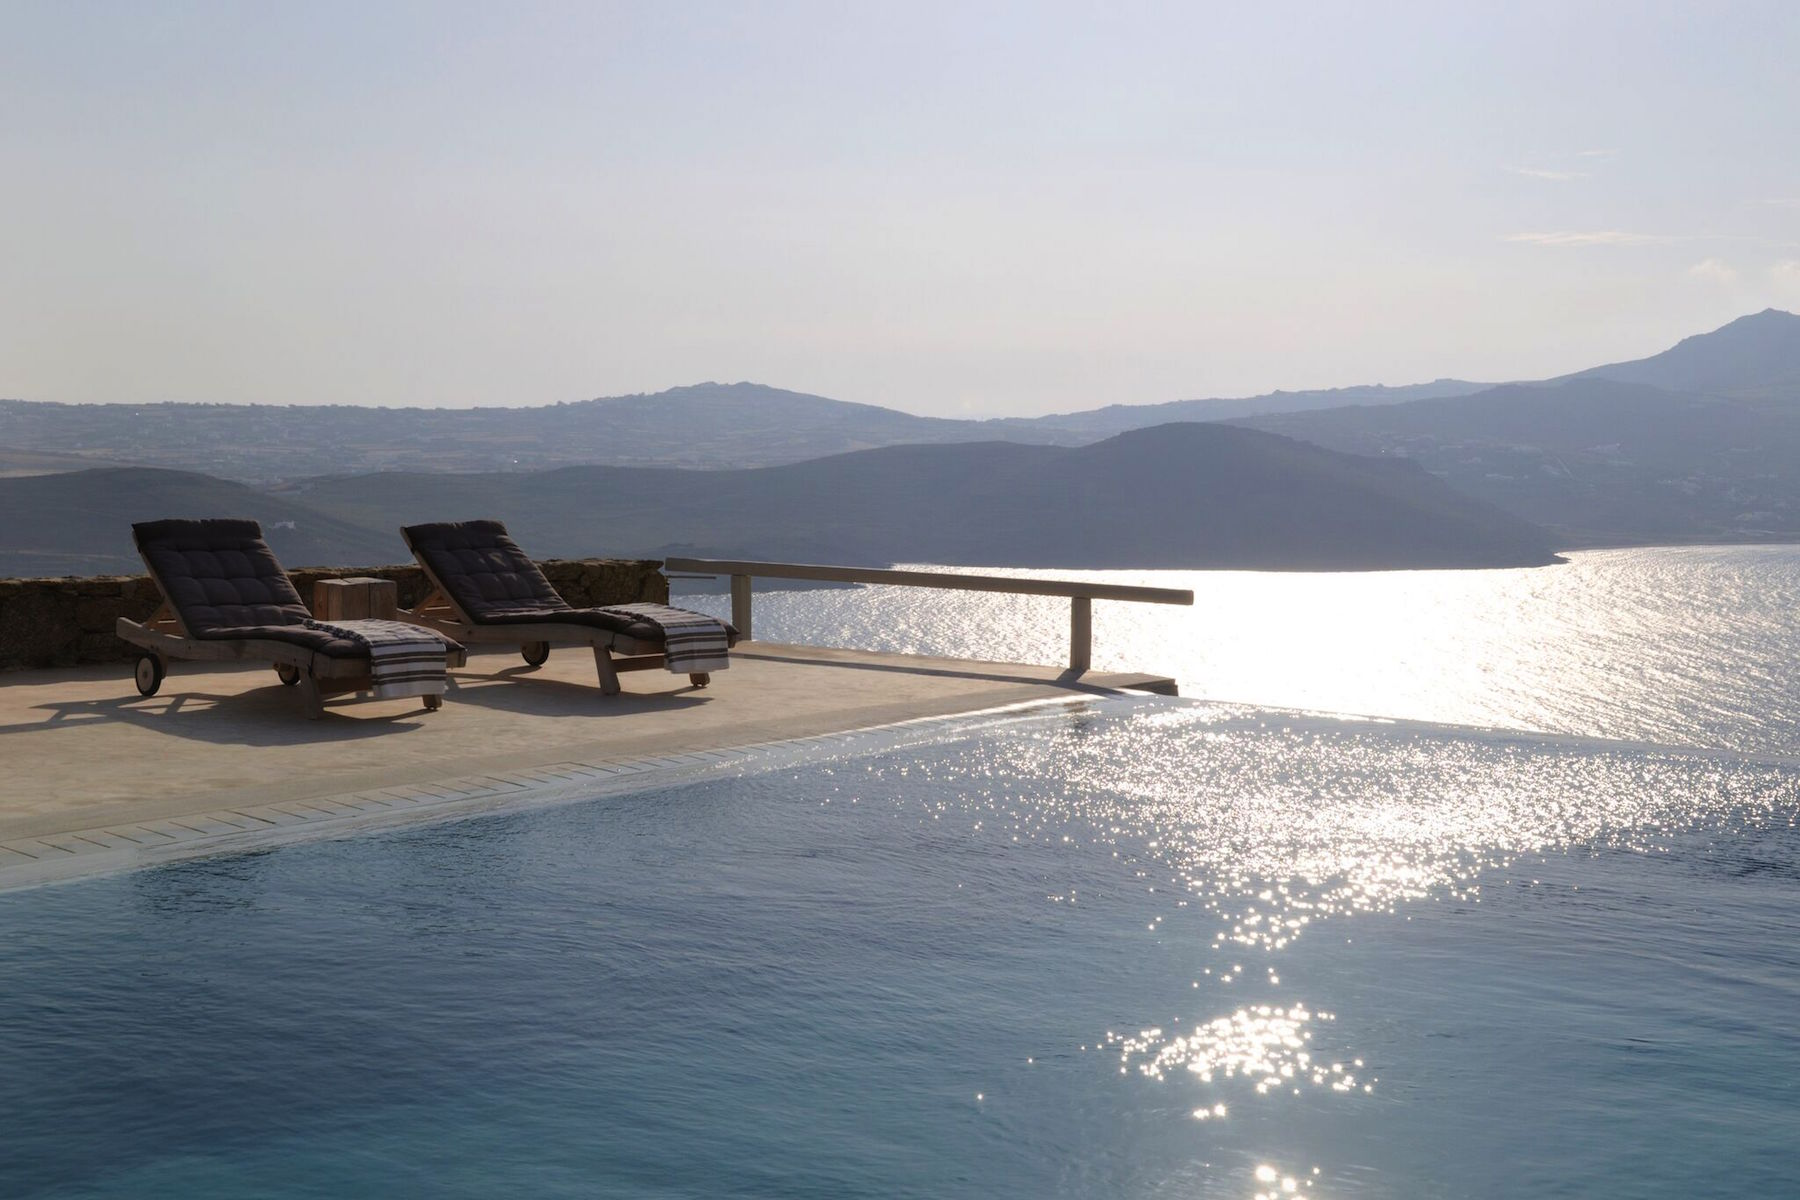 Single Family Home for Sale at Oceda Ftelia Oceda Mykonos, Southern Aegean, 84600 Greece